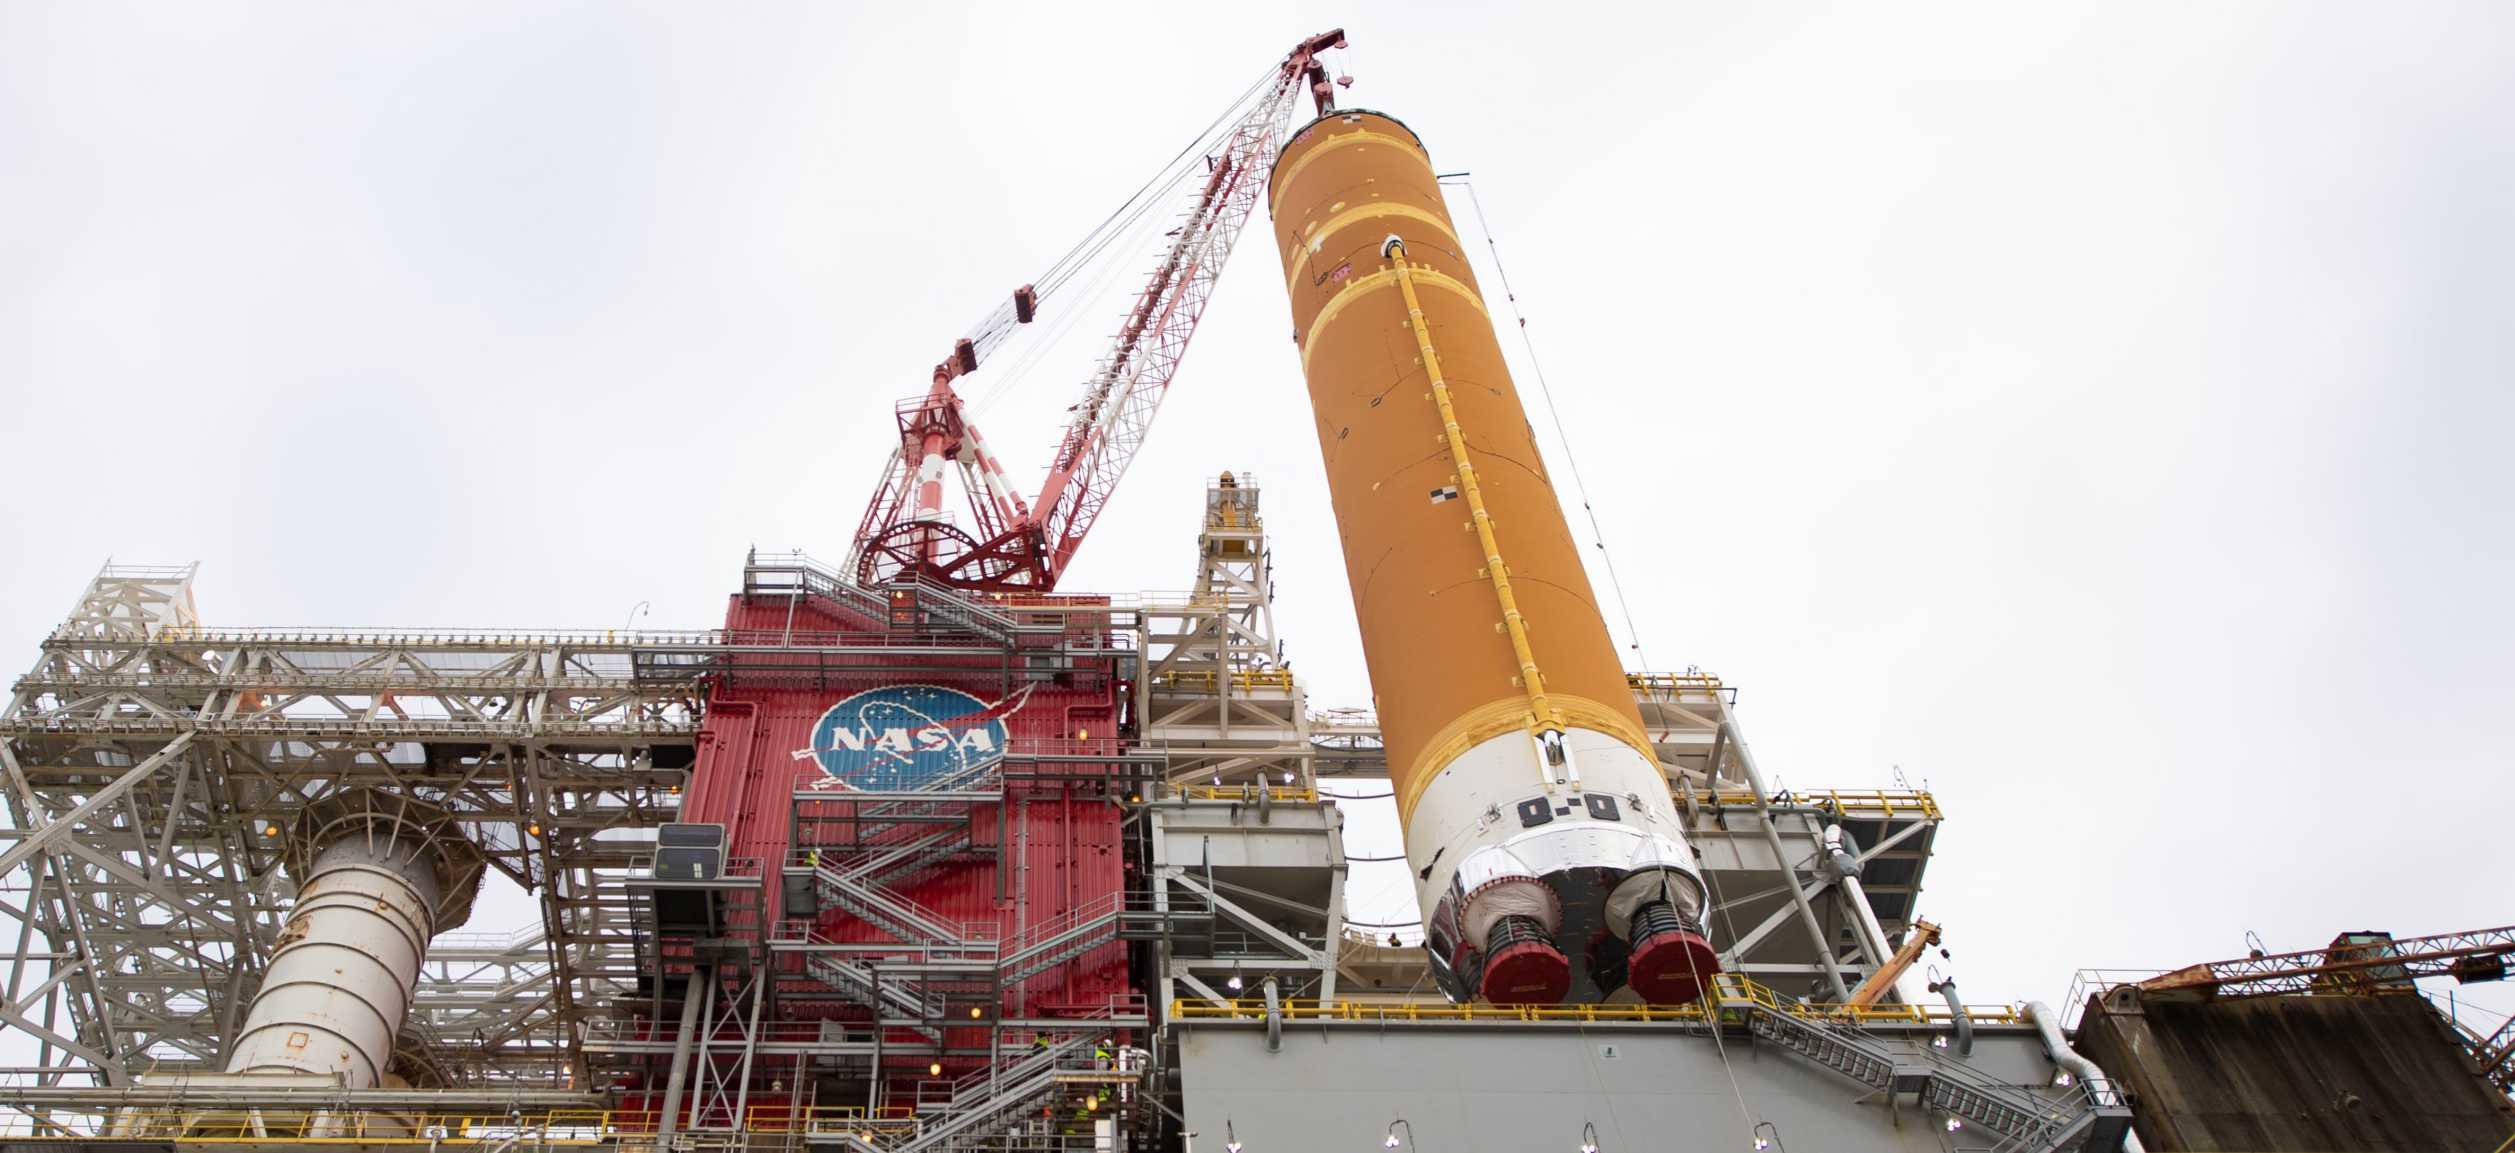 SLS CS-1 Stennis lift 012220 (NASA) 16 crop (c)